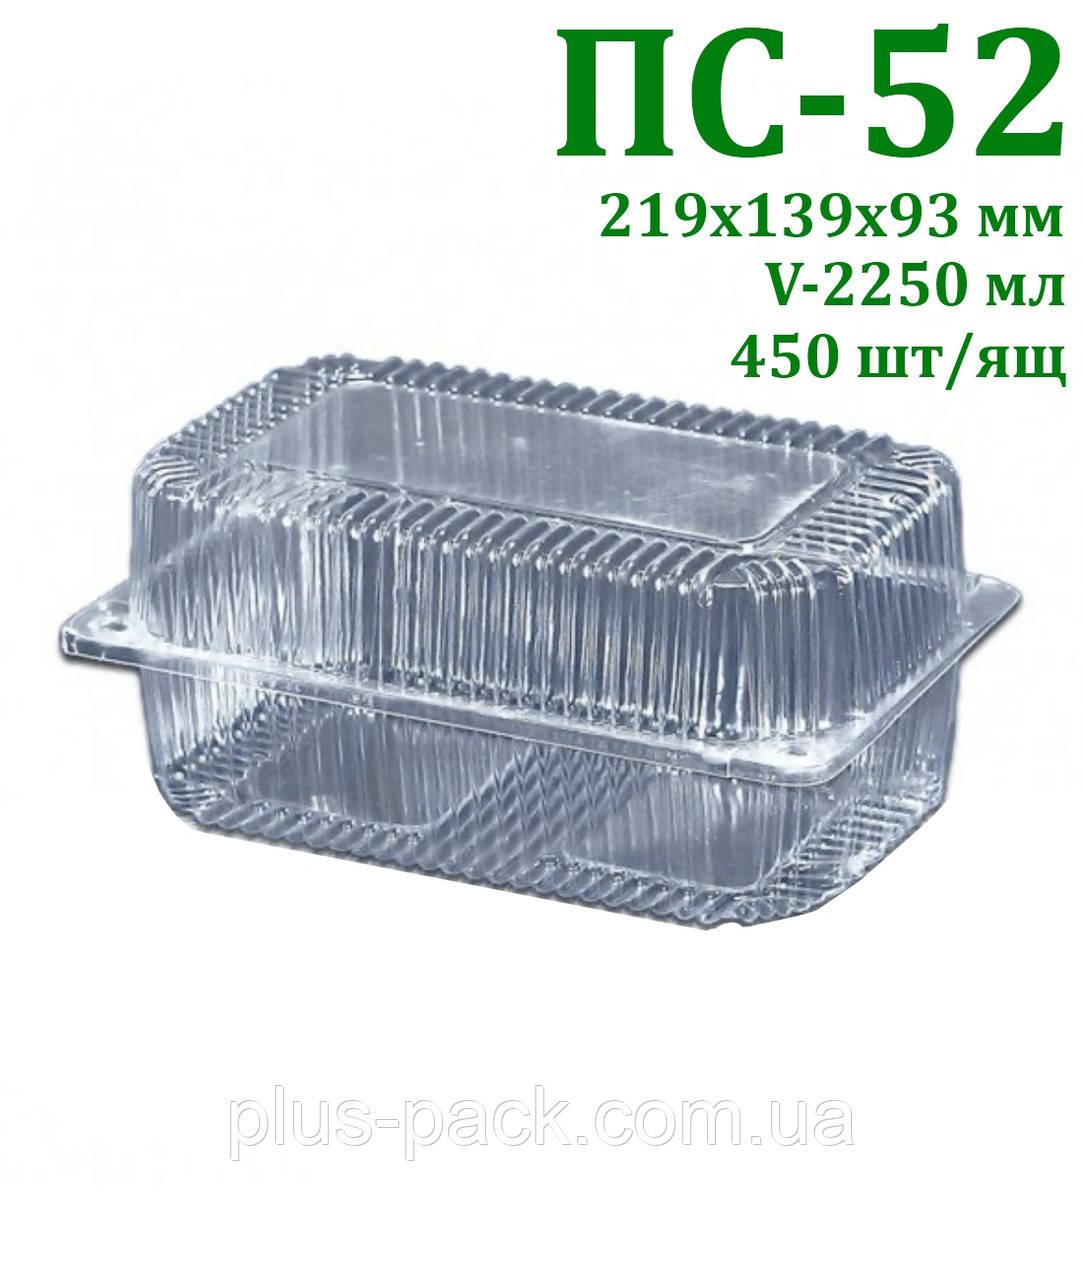 Упаковка Пластикова (2250 мл)